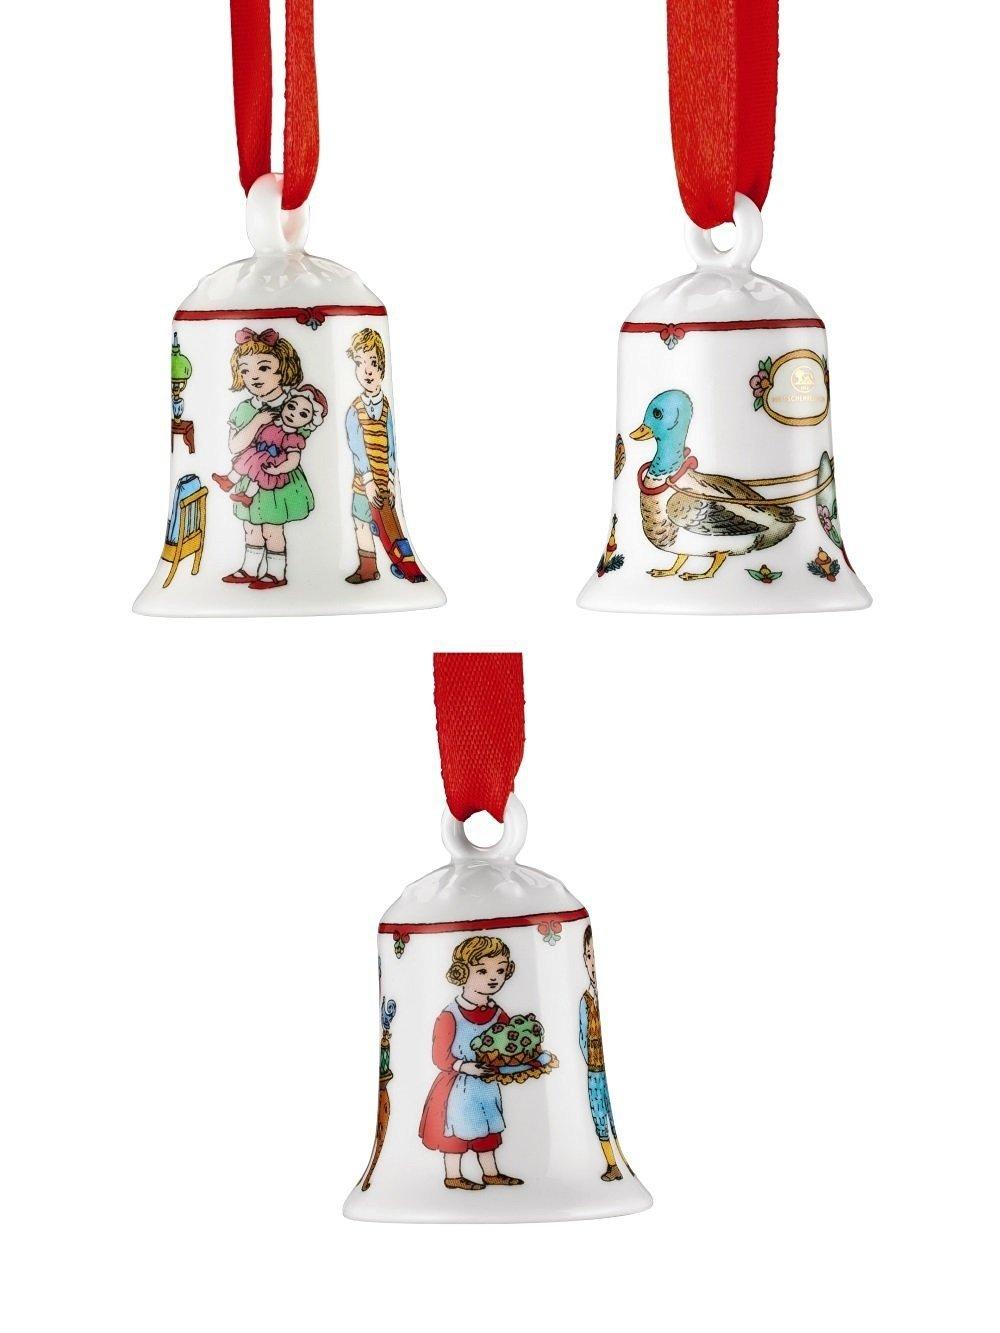 Hutschenreuther - 3 x Mini-Glocke 2016 - 3 Motive - Miniglocke Miniaturglocke Glocke - NEU - OVP